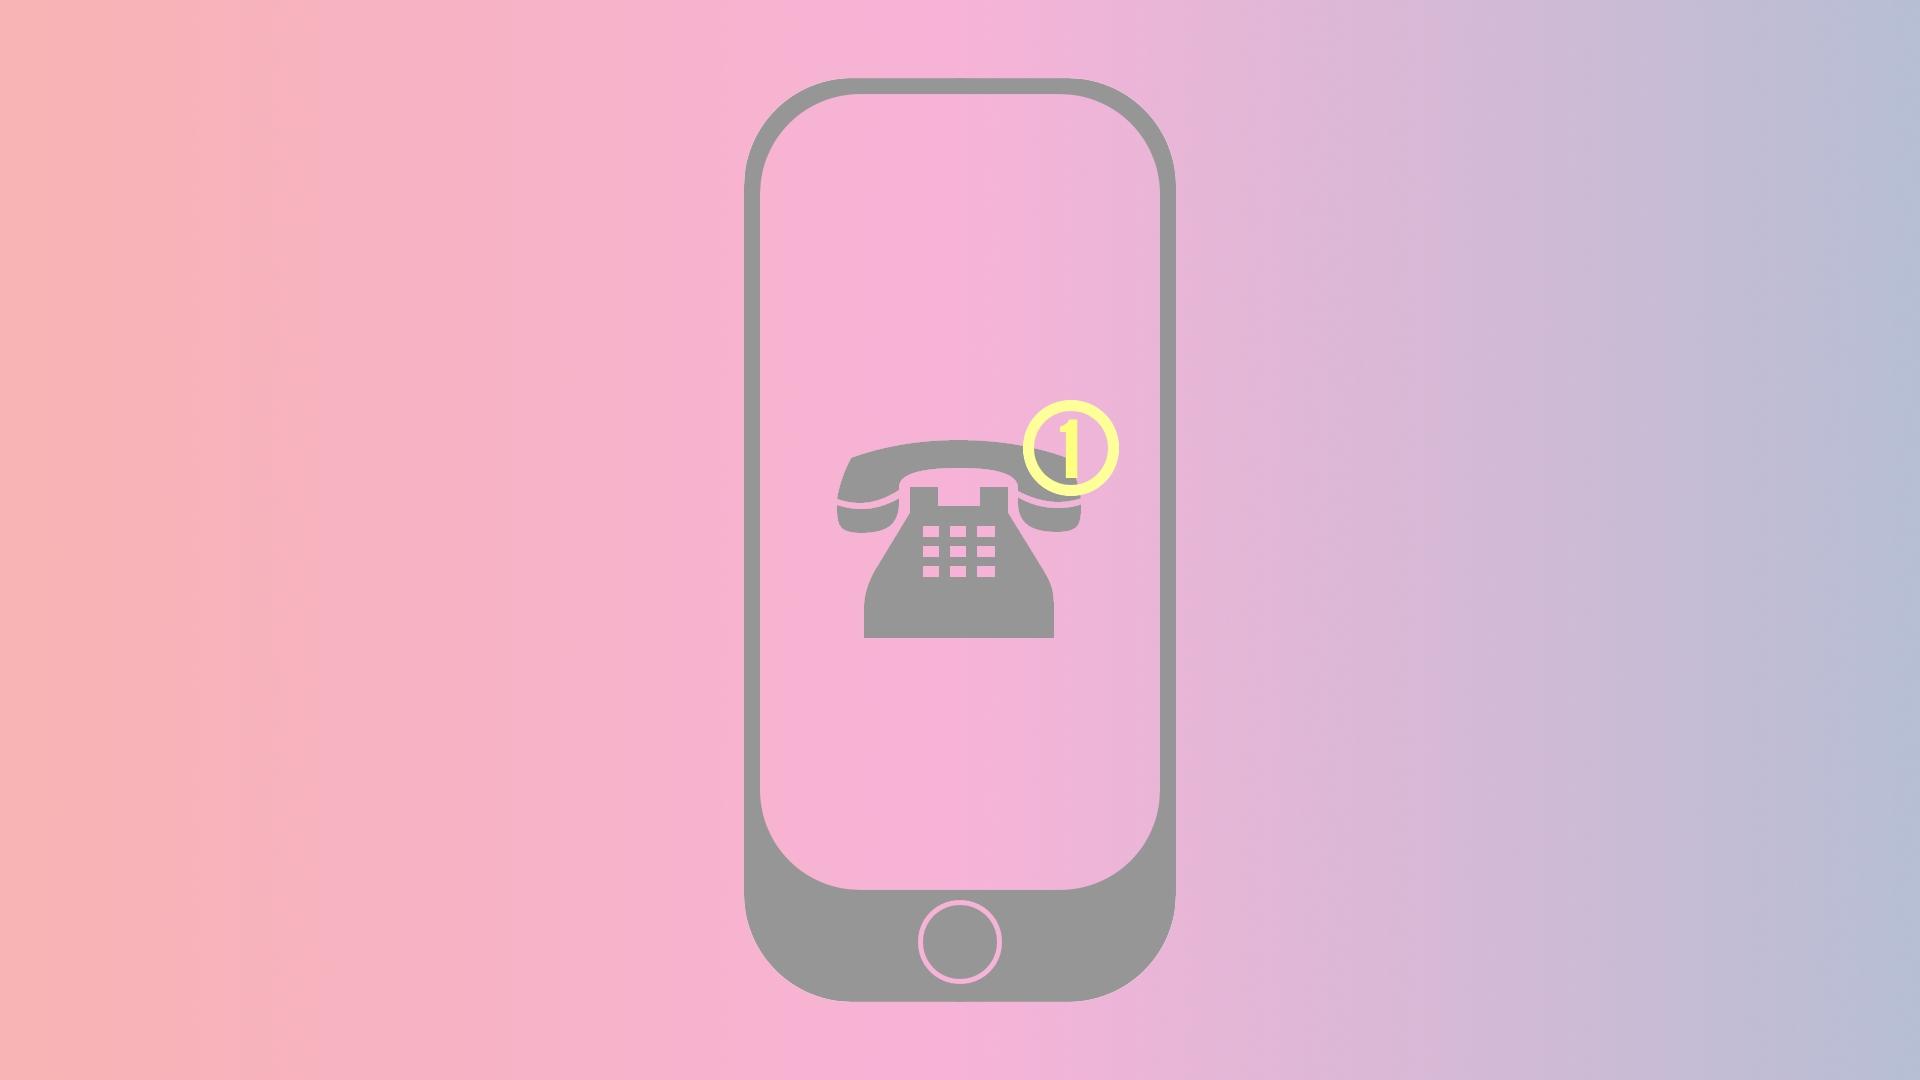 Ausland t mobile mailbox nummer Voicemail, bereikbaar